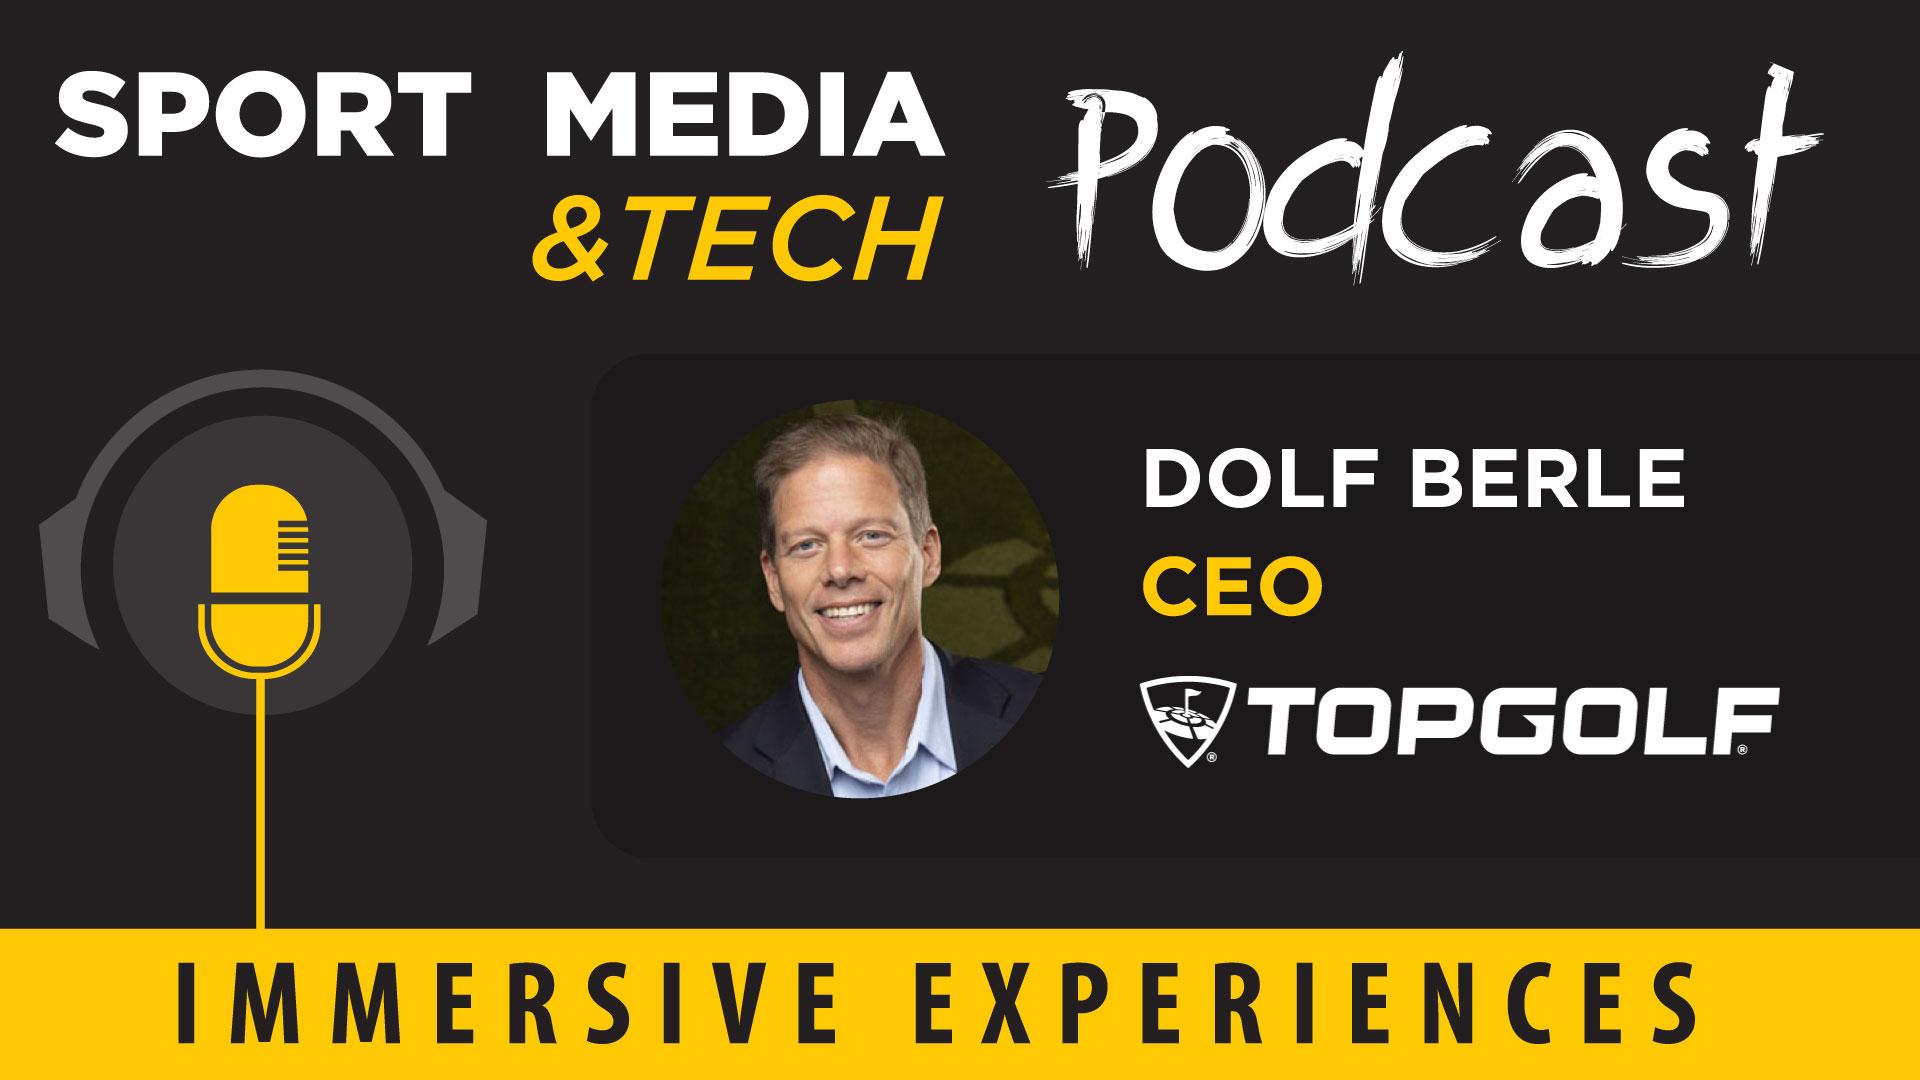 Episode 18: Immersive Experiences & Topgolf